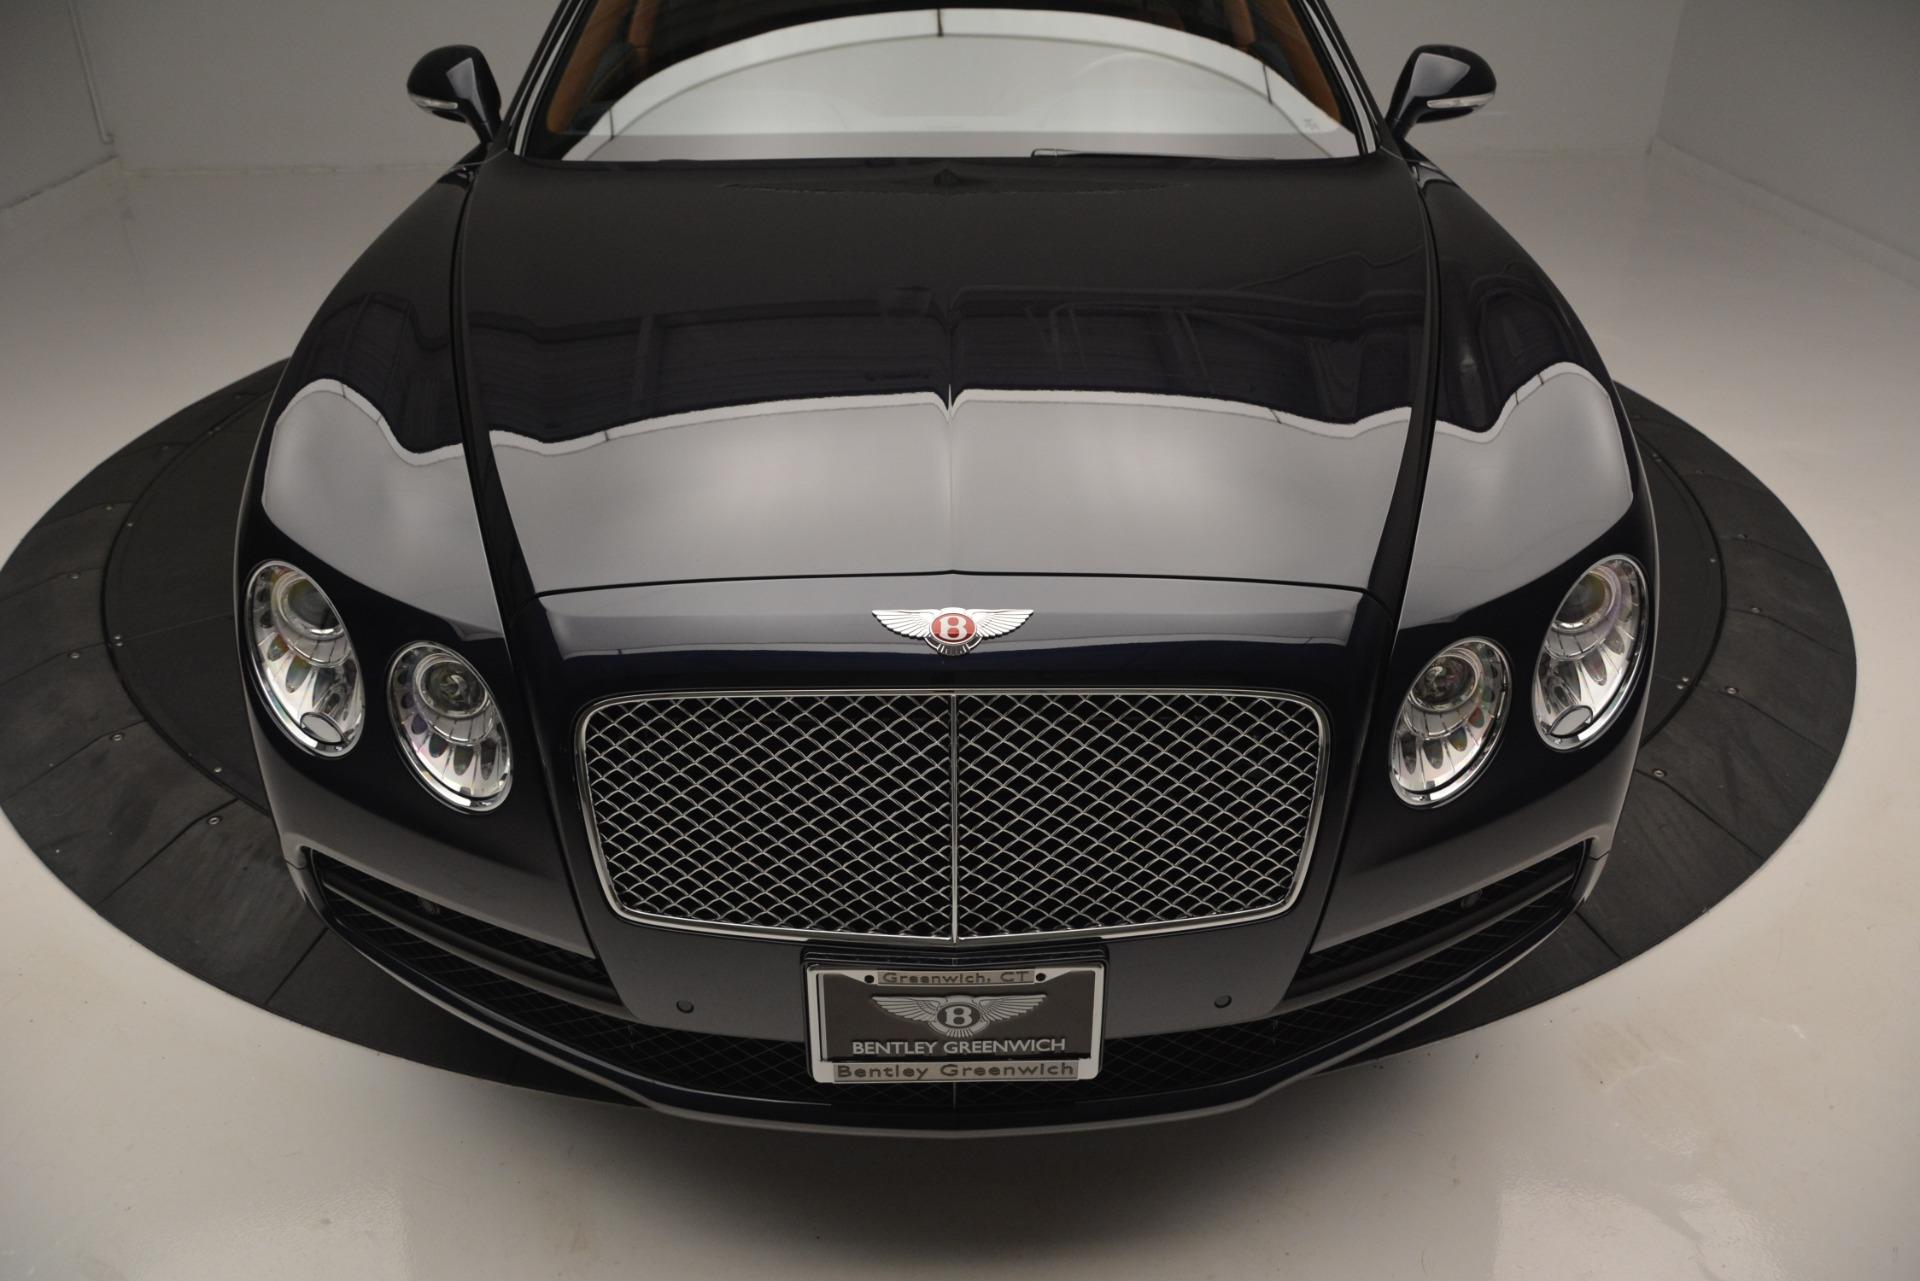 New 2018 Bentley Flying Spur V8 For Sale In Westport, CT 2601_p13